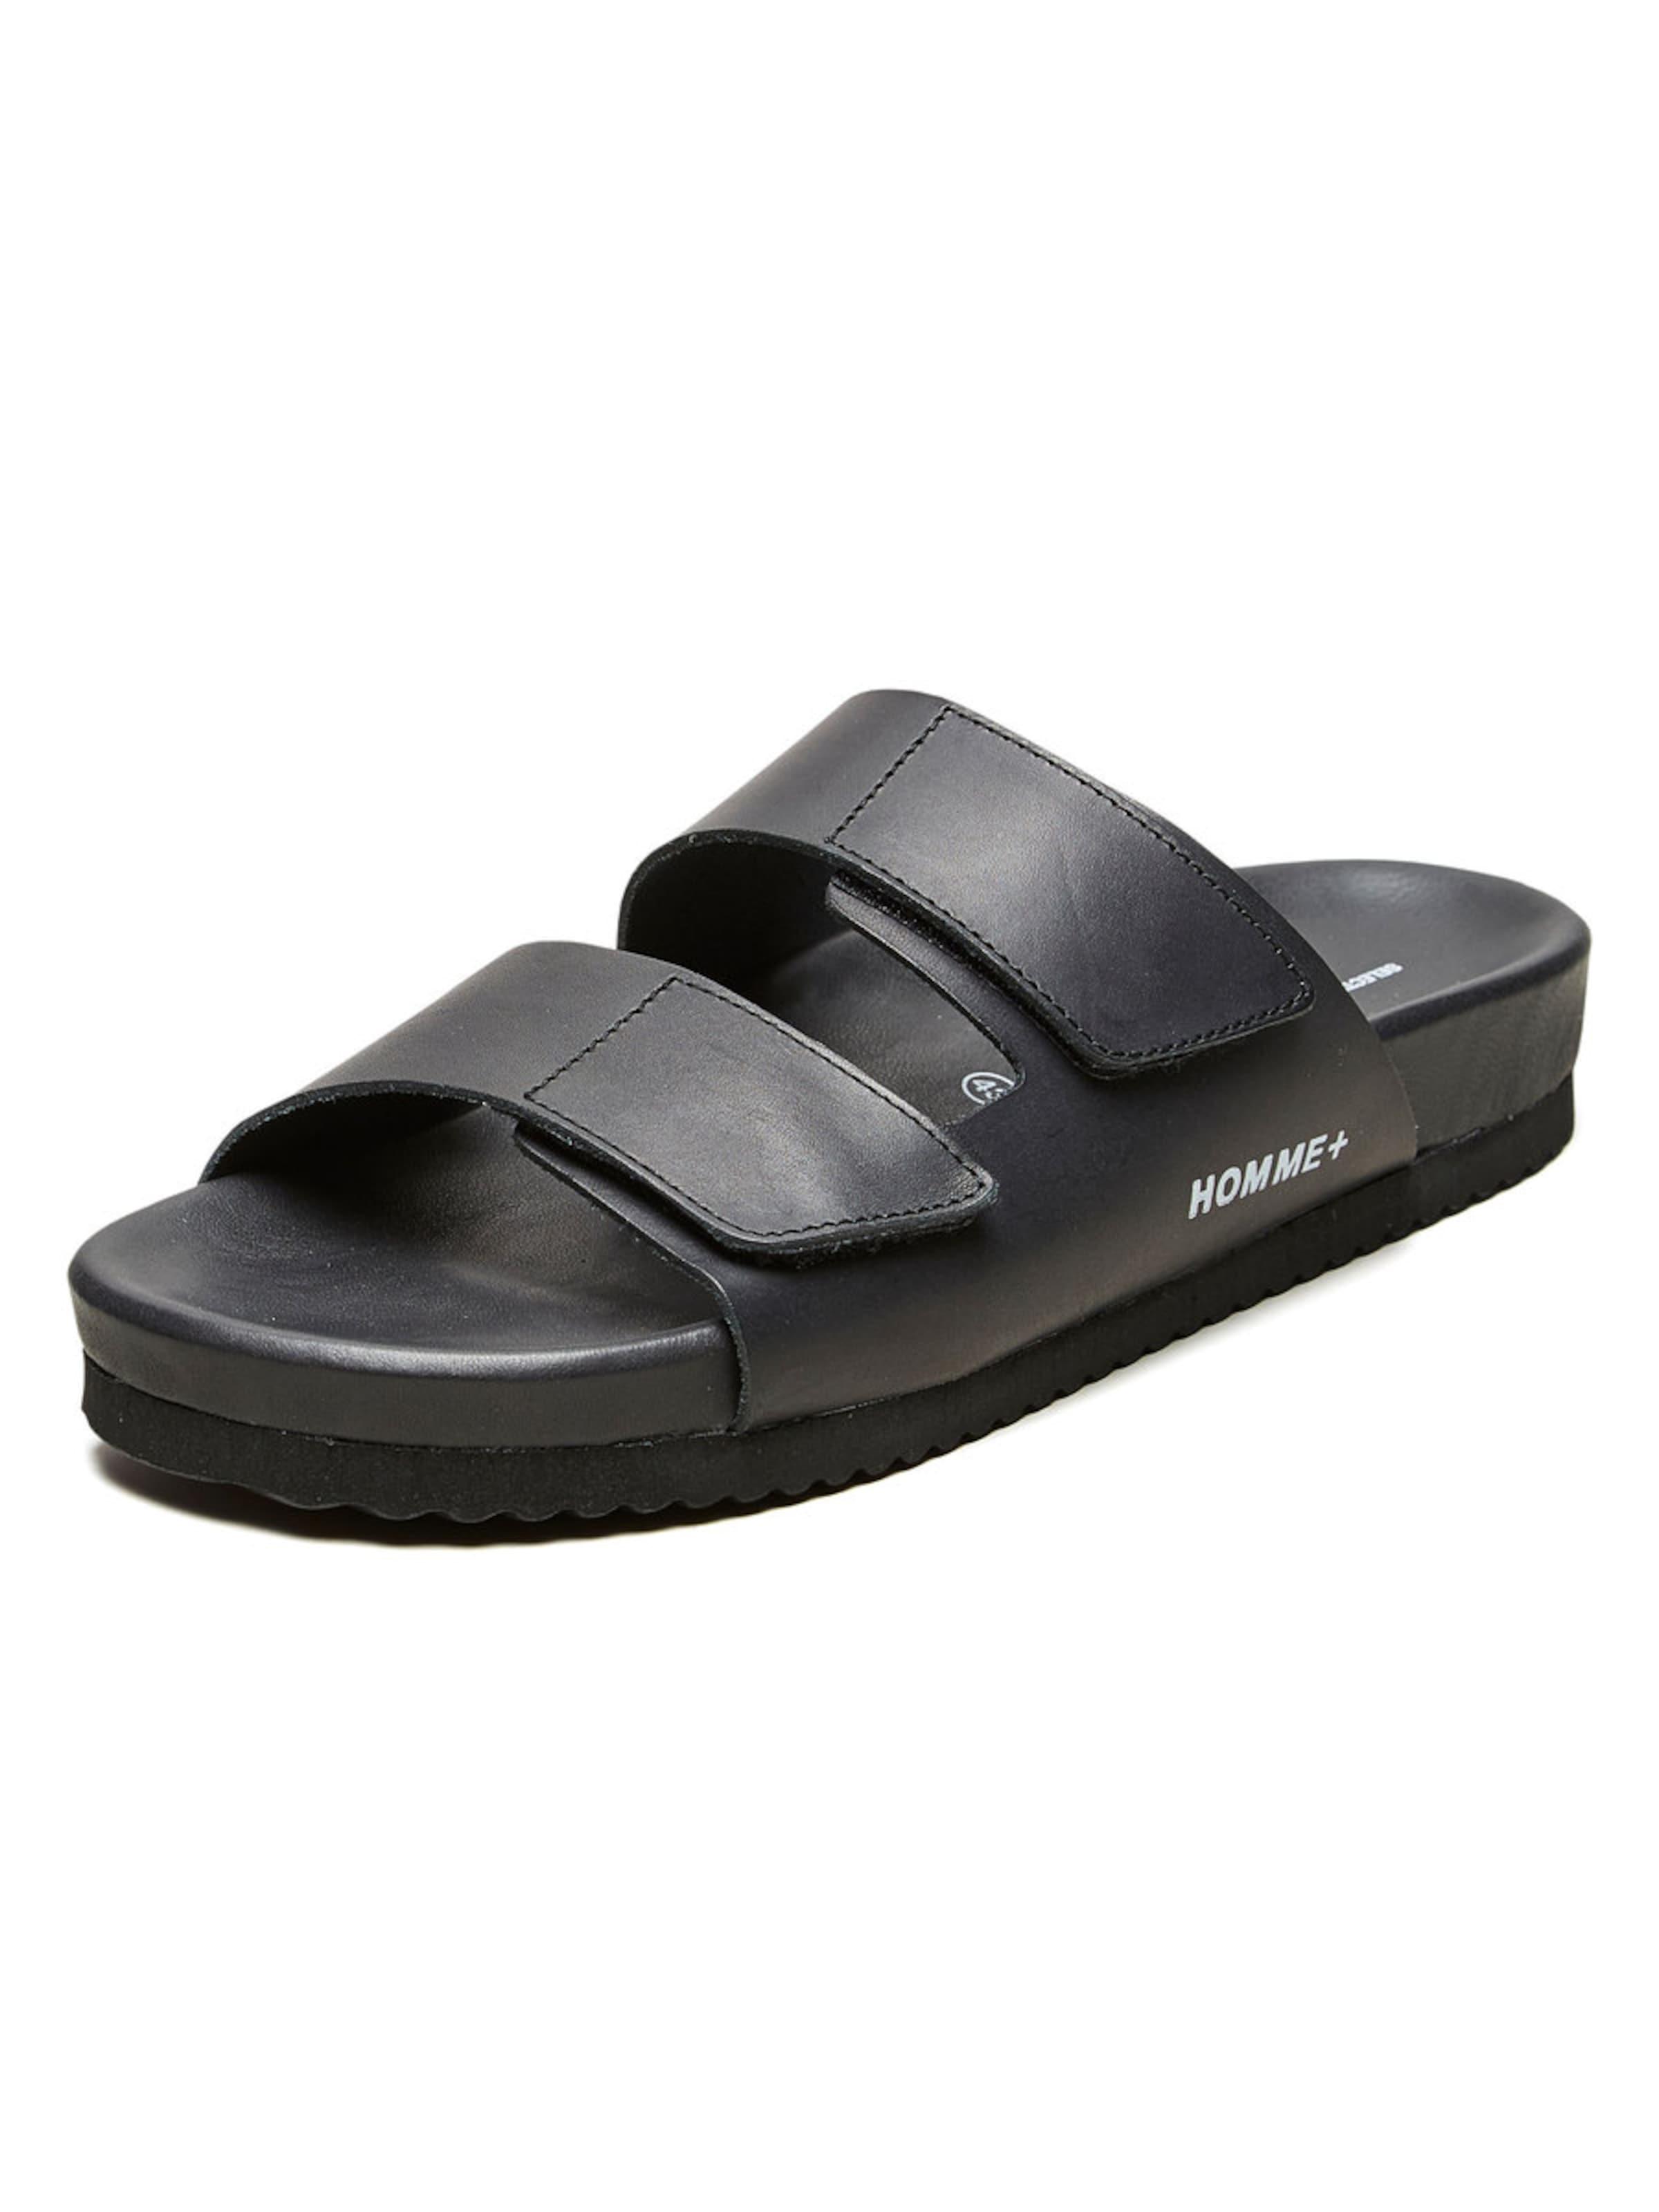 SELECTED HOMME Sandalen Verschleißfeste billige Schuhe